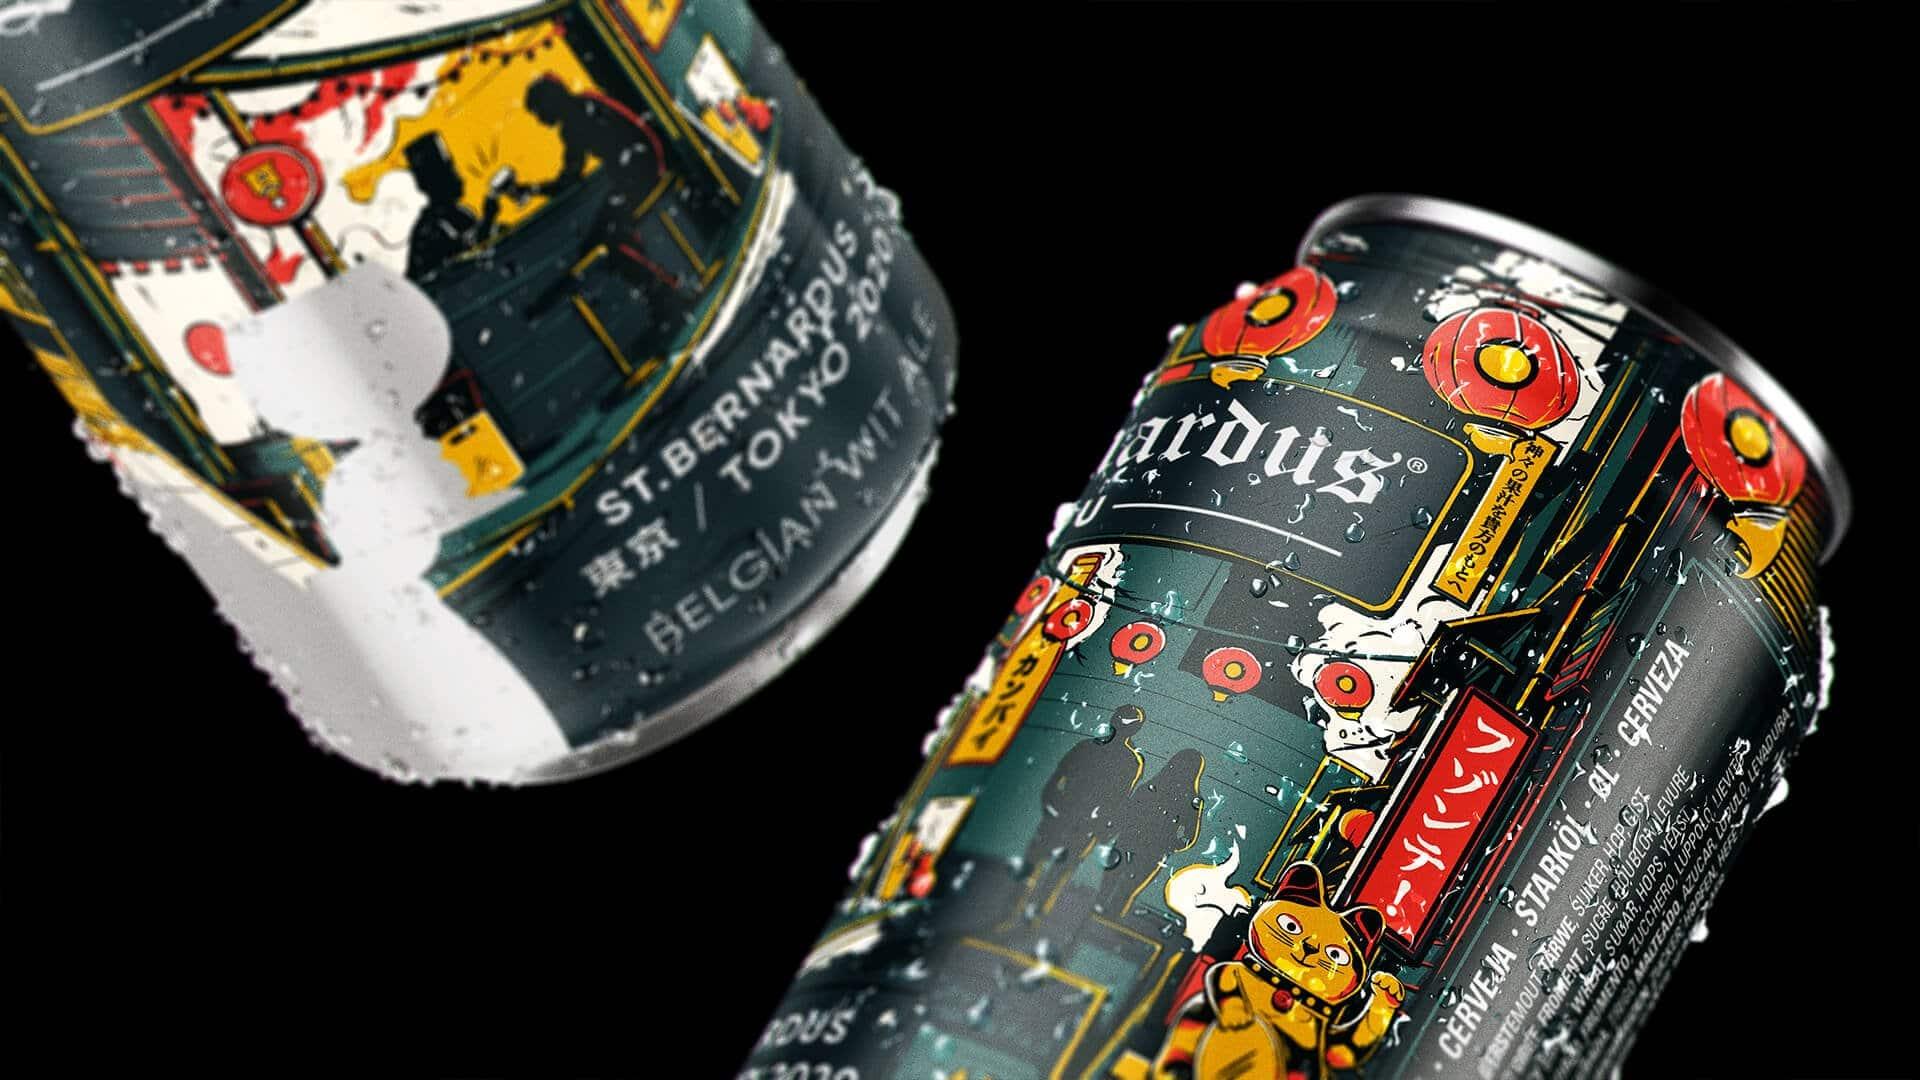 Closeup St Bernardus Tokyo Beer can